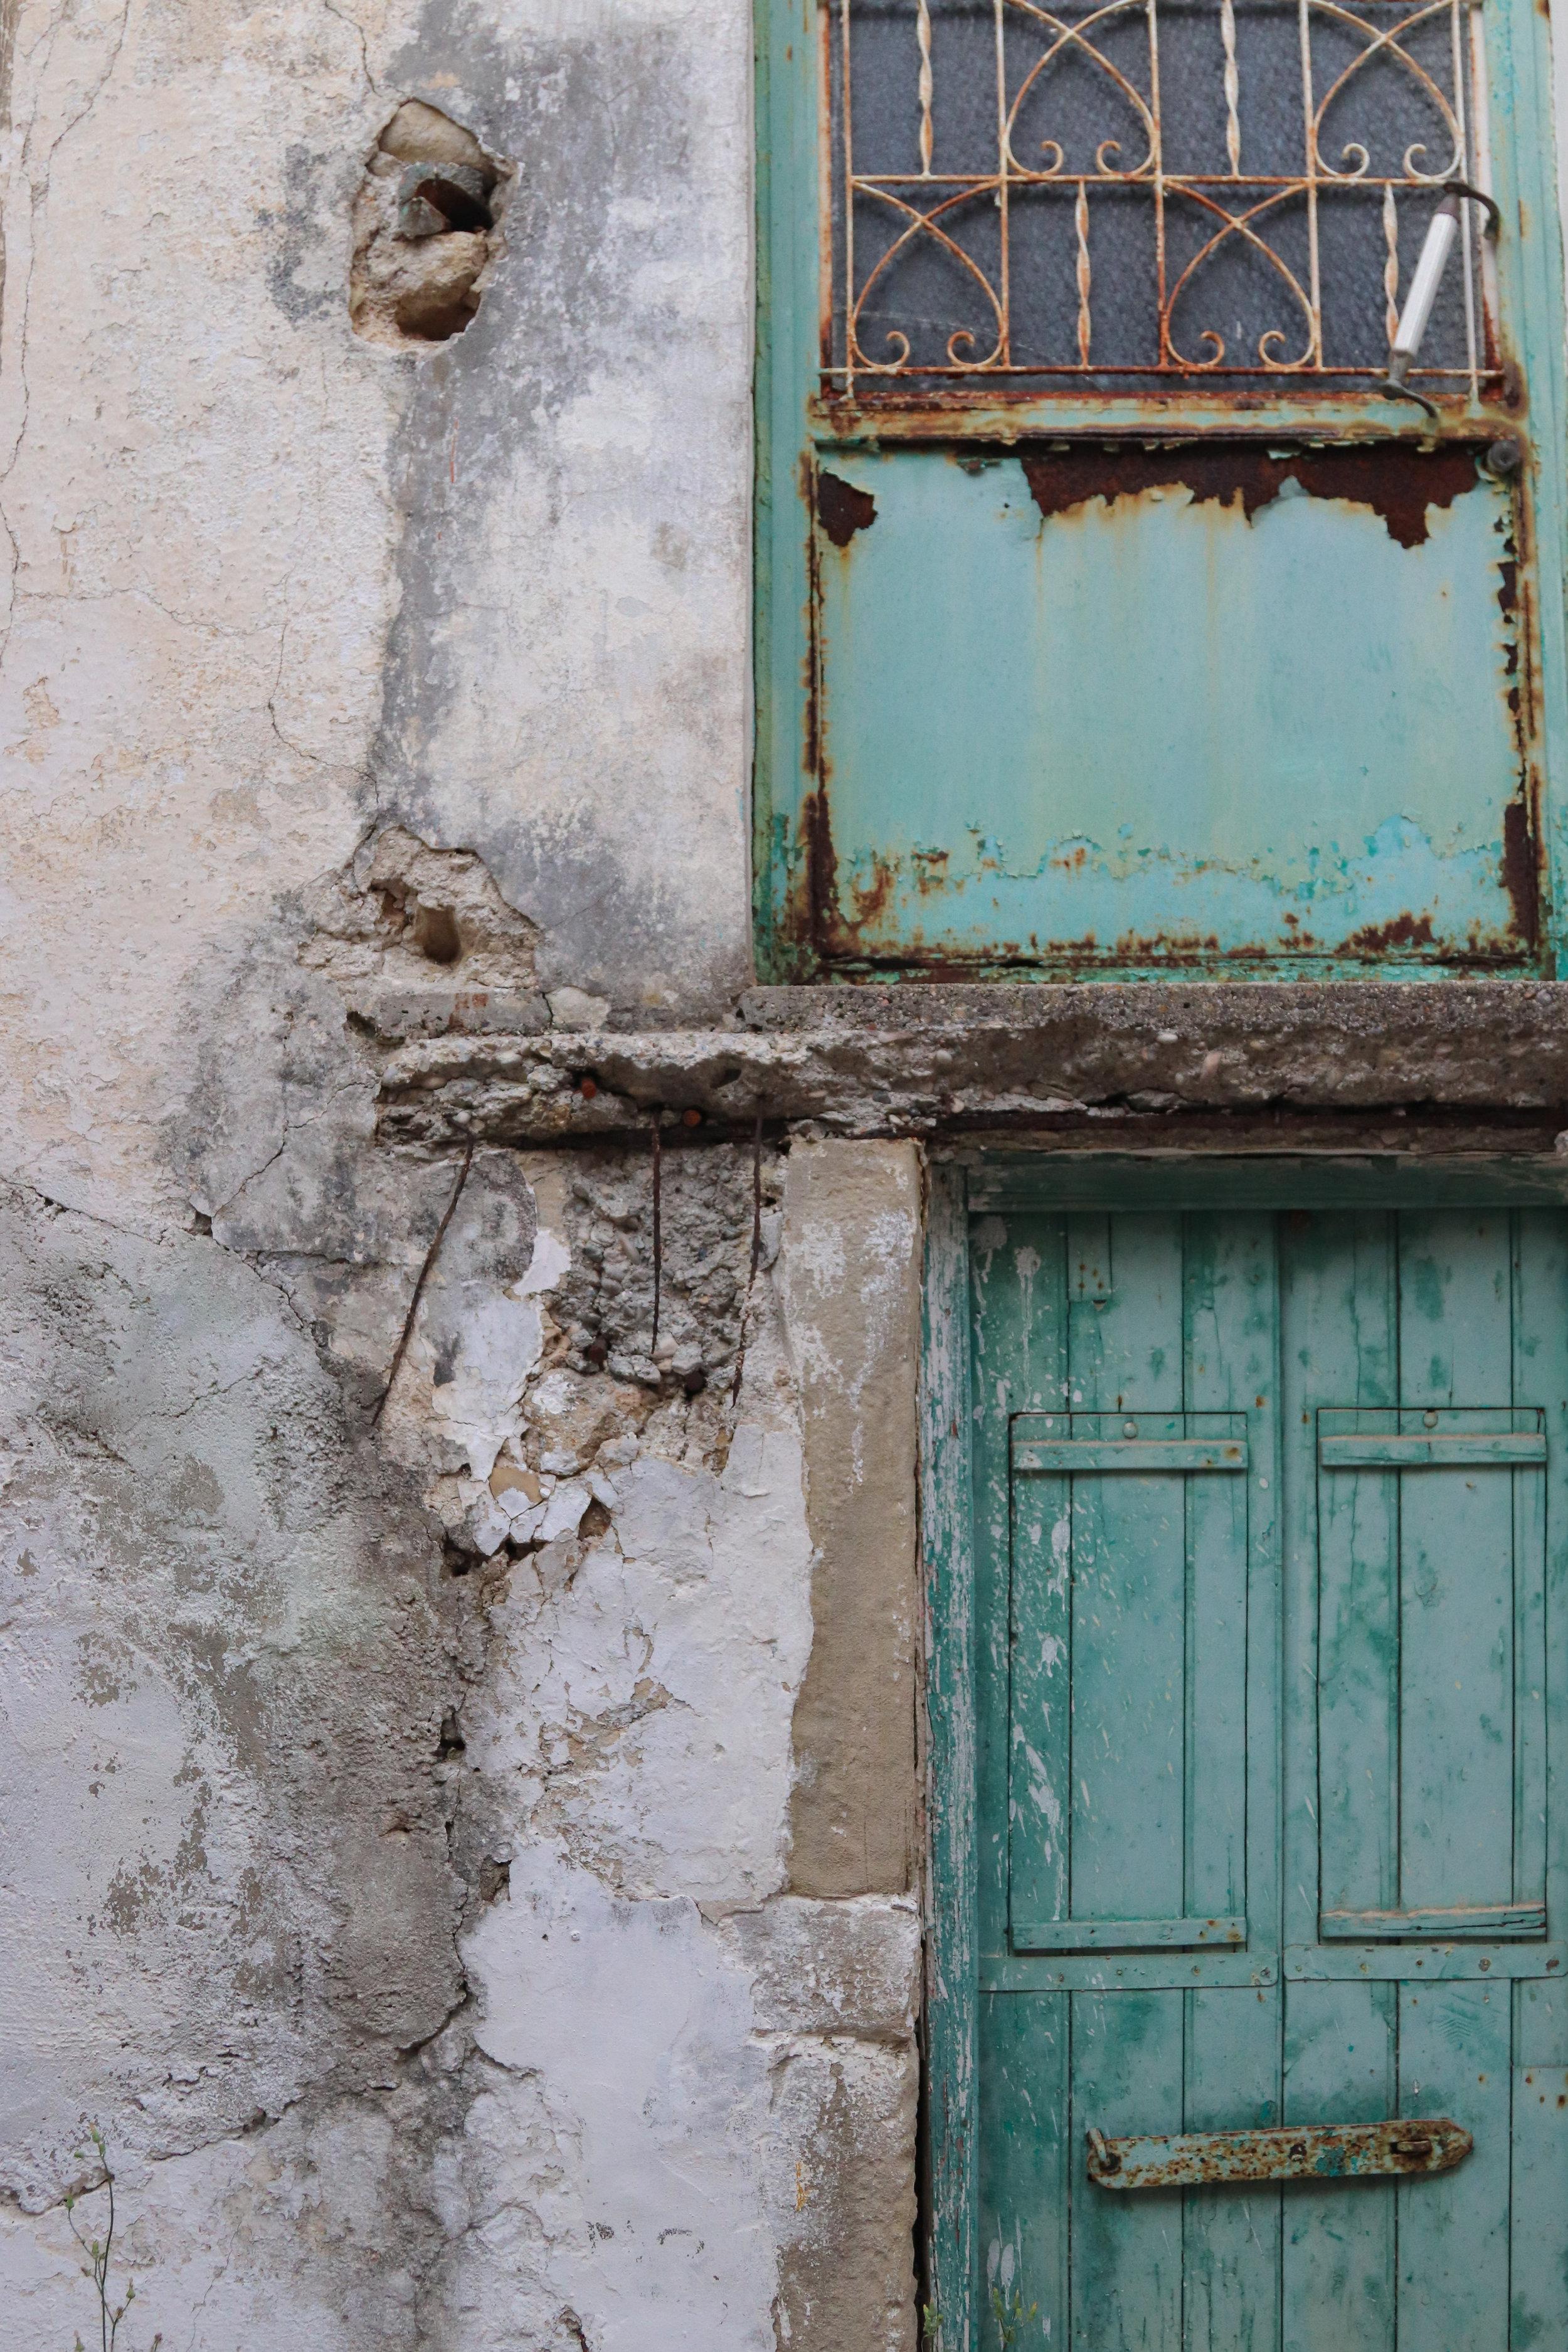 the 13th century village of Chlomos, Greece, in Corfu